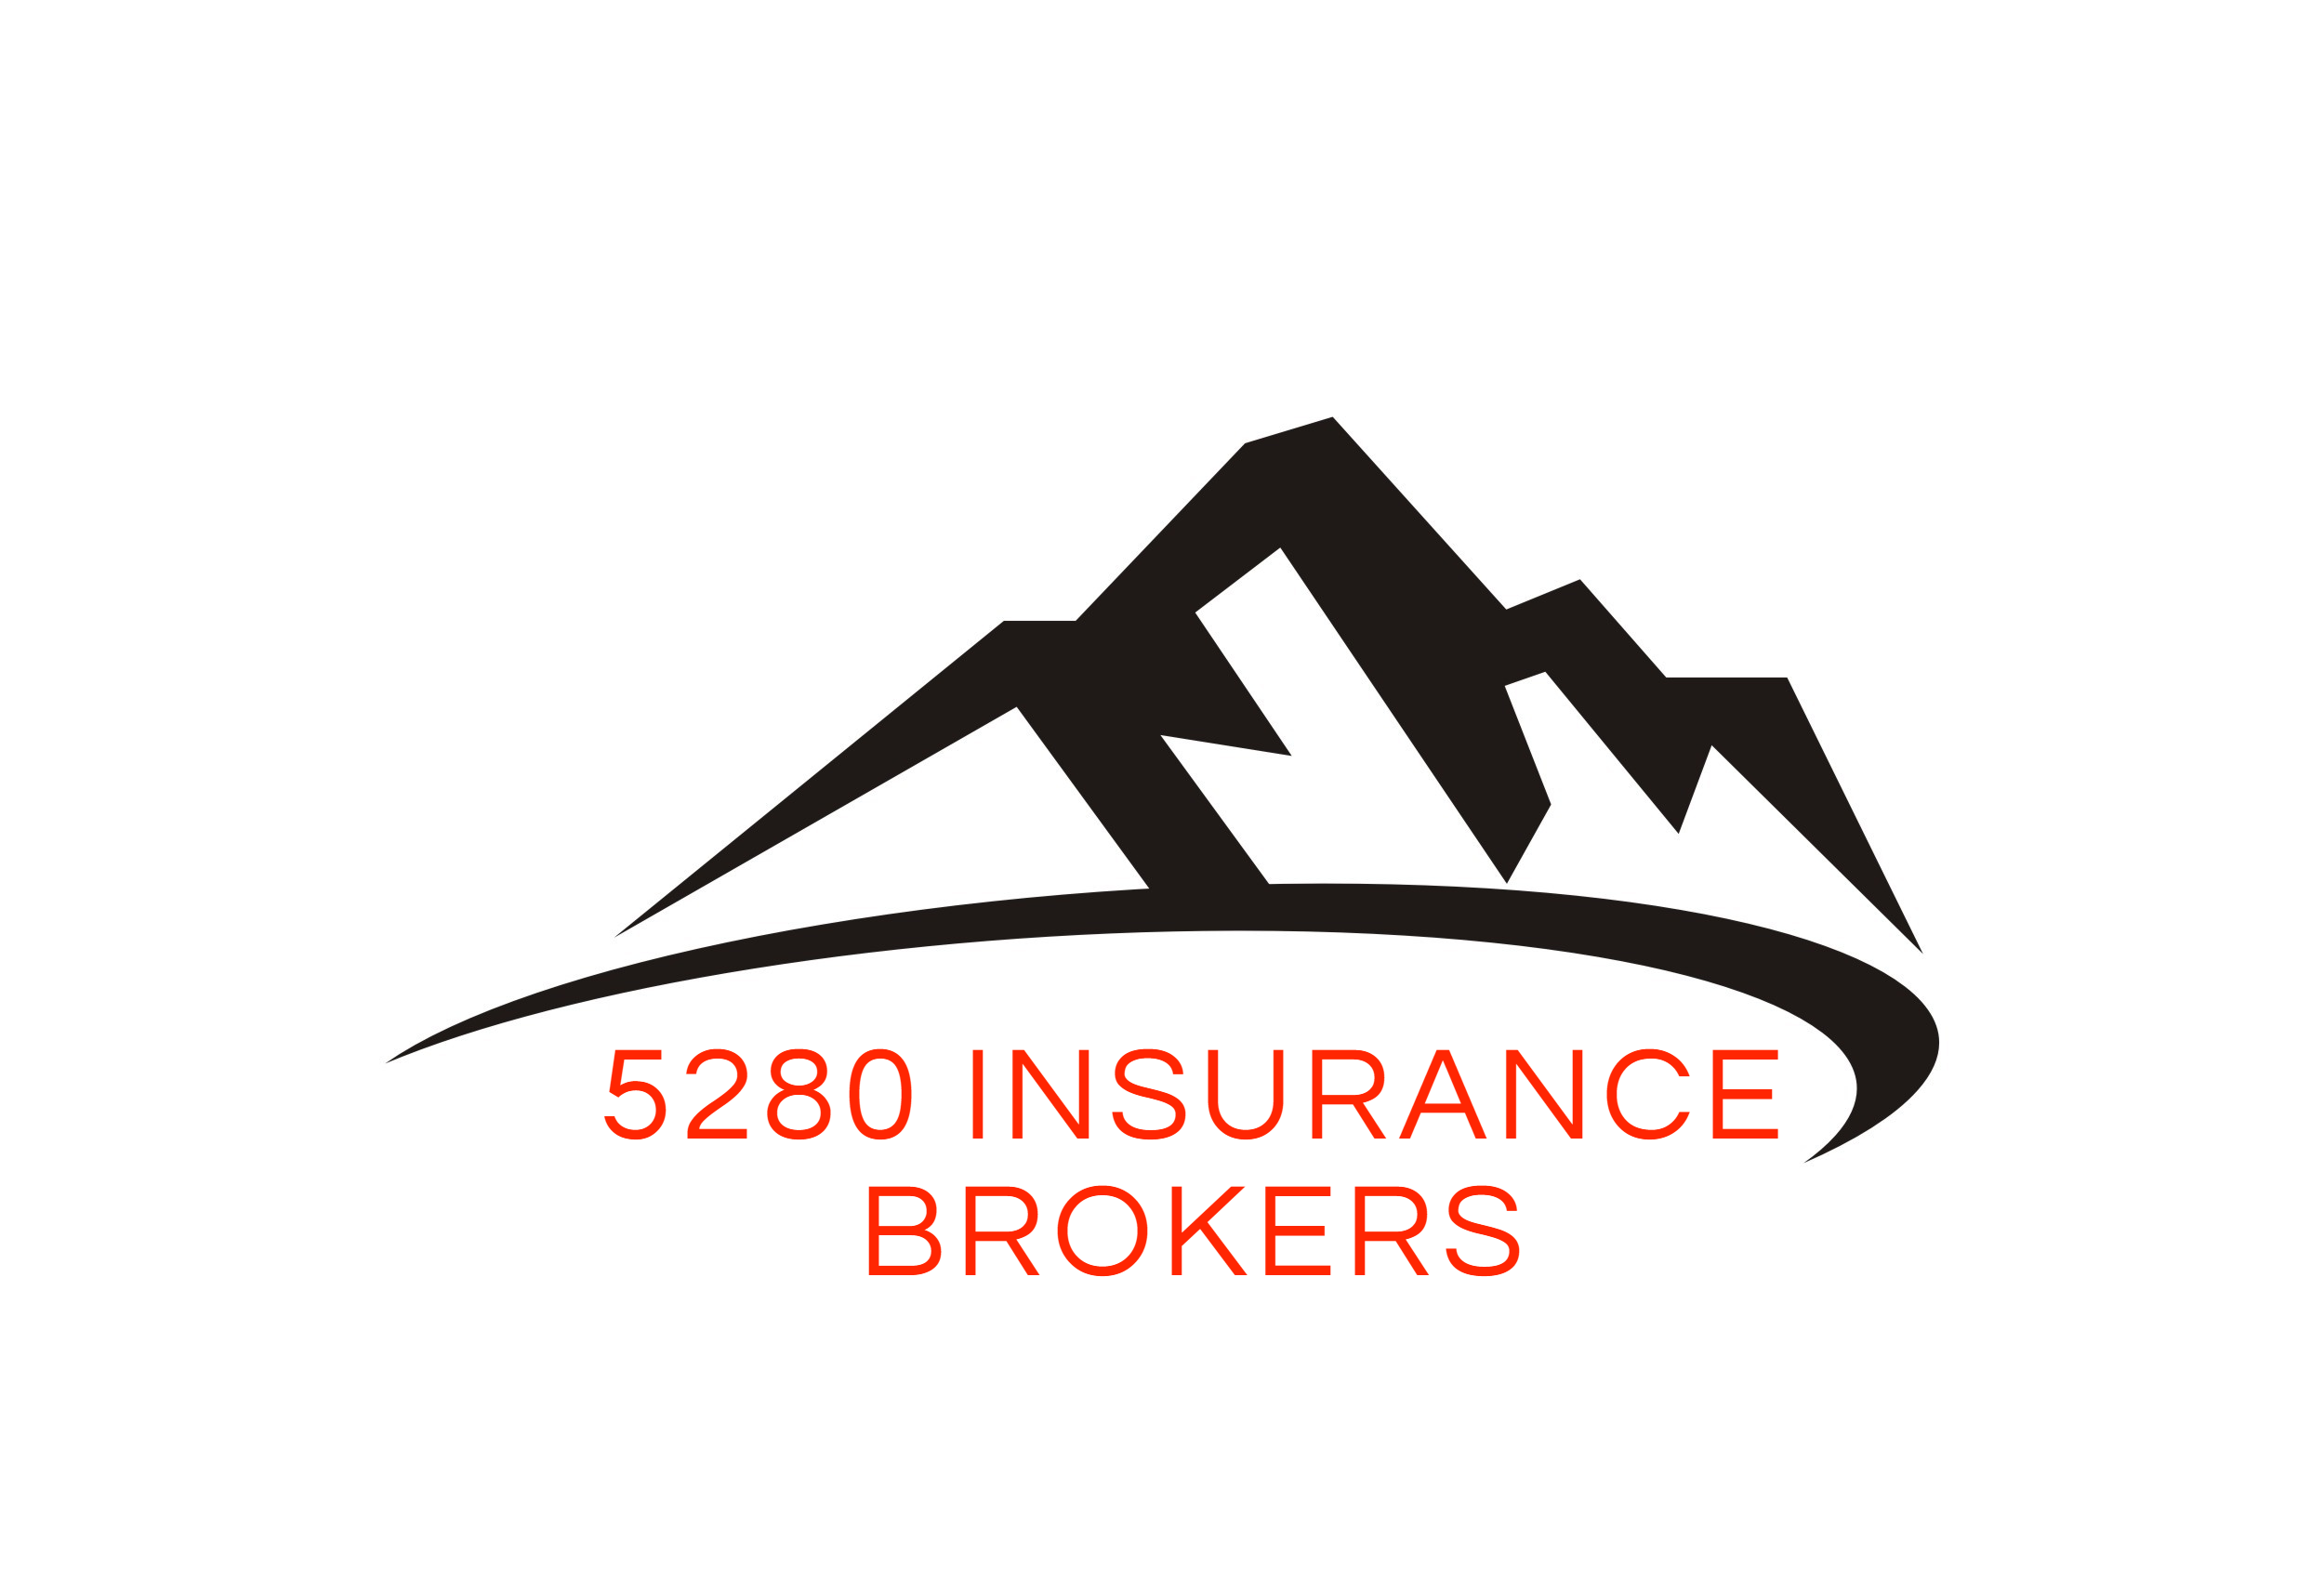 5280 Insurance Brokers image 0